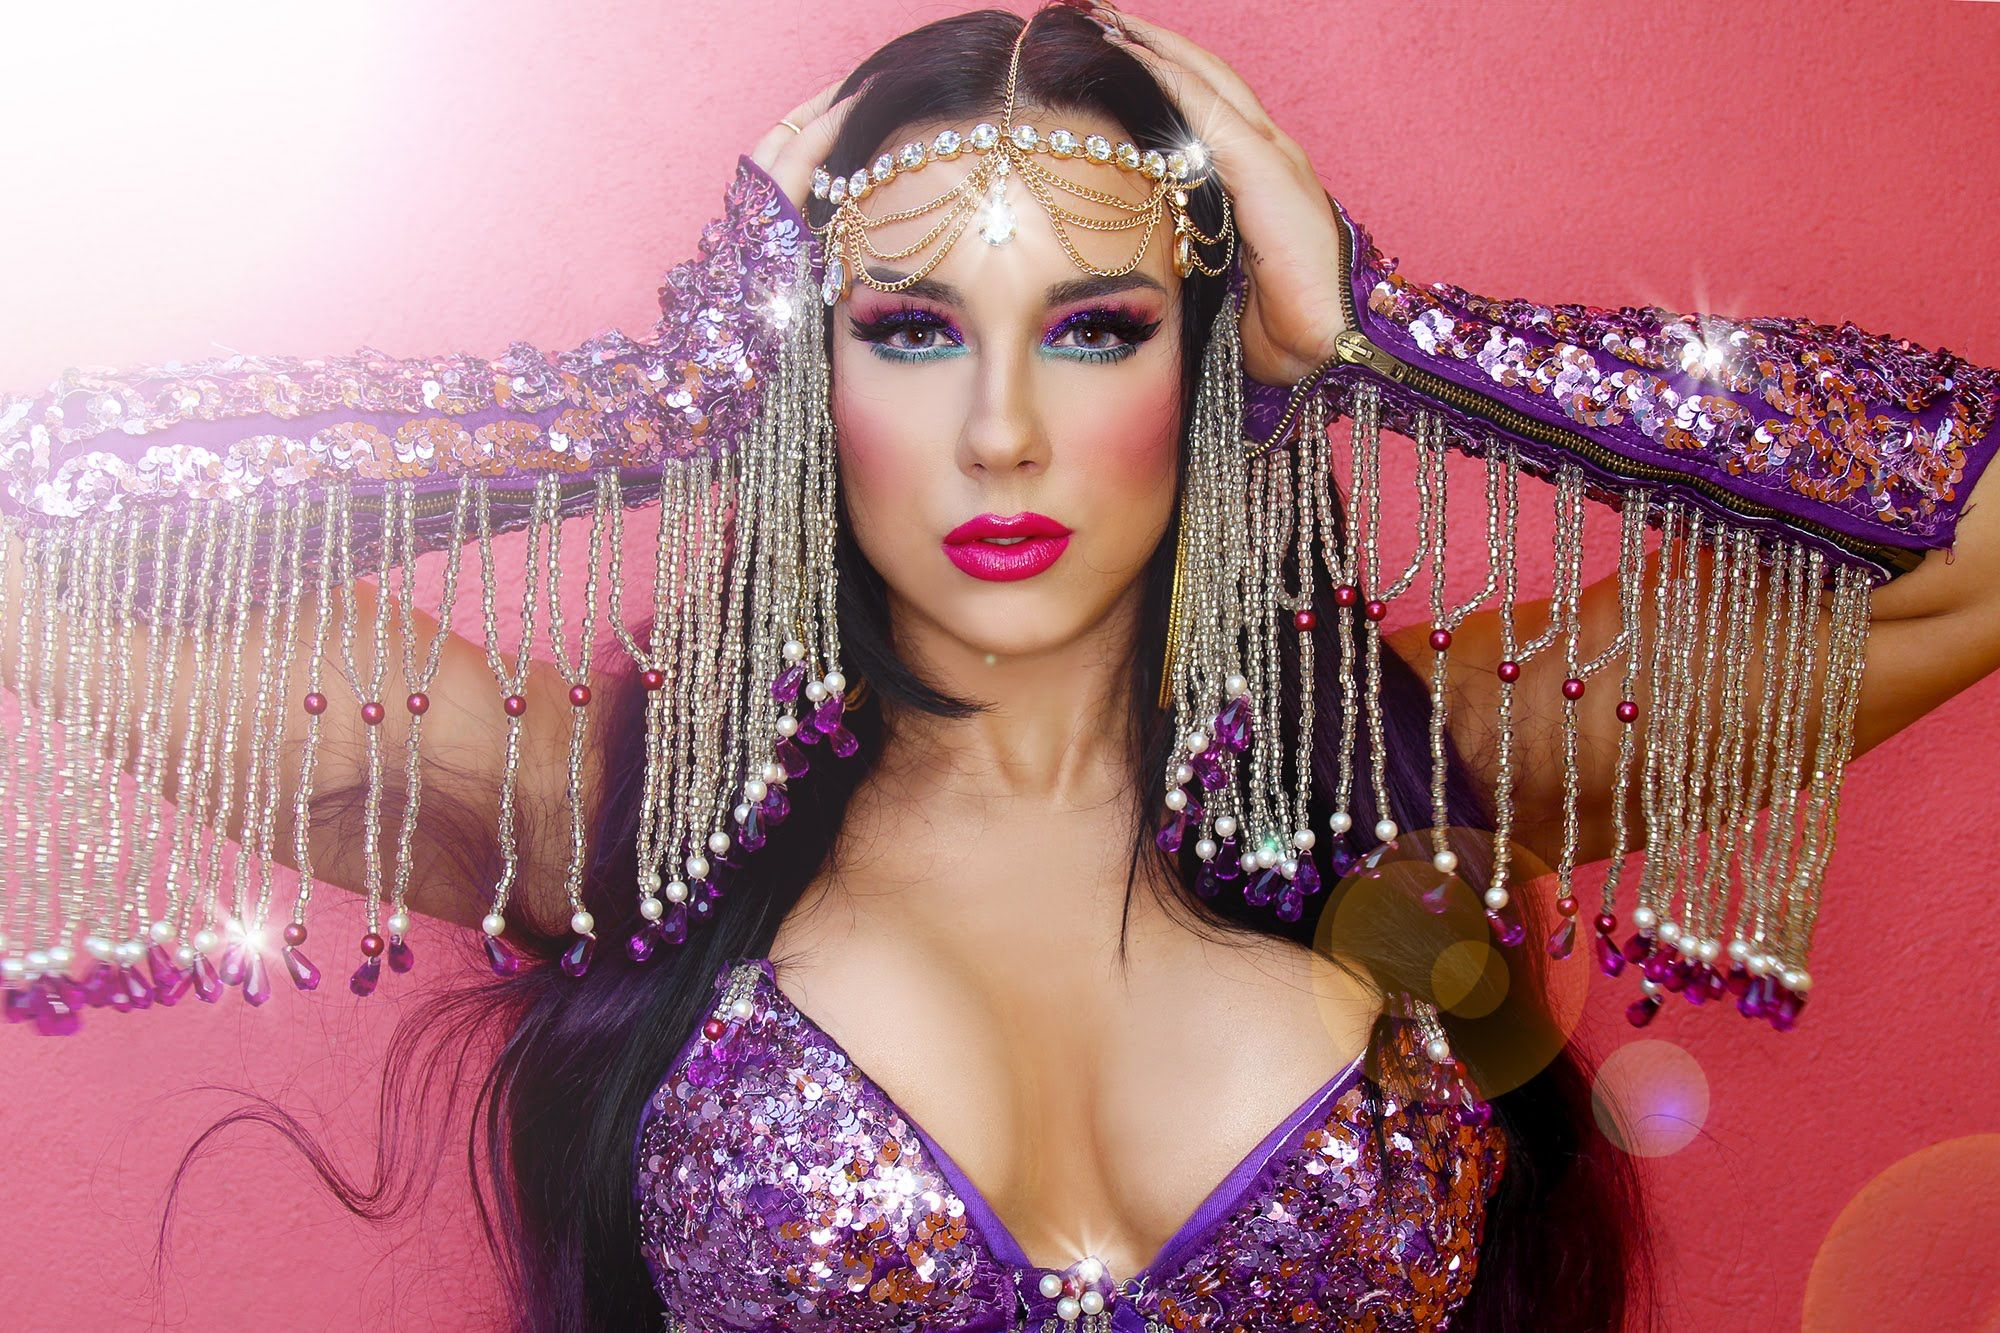 Gypsybellydance belly dancer gypsy halloween makeup let the halloween makeup tutorials commence baditri Gallery